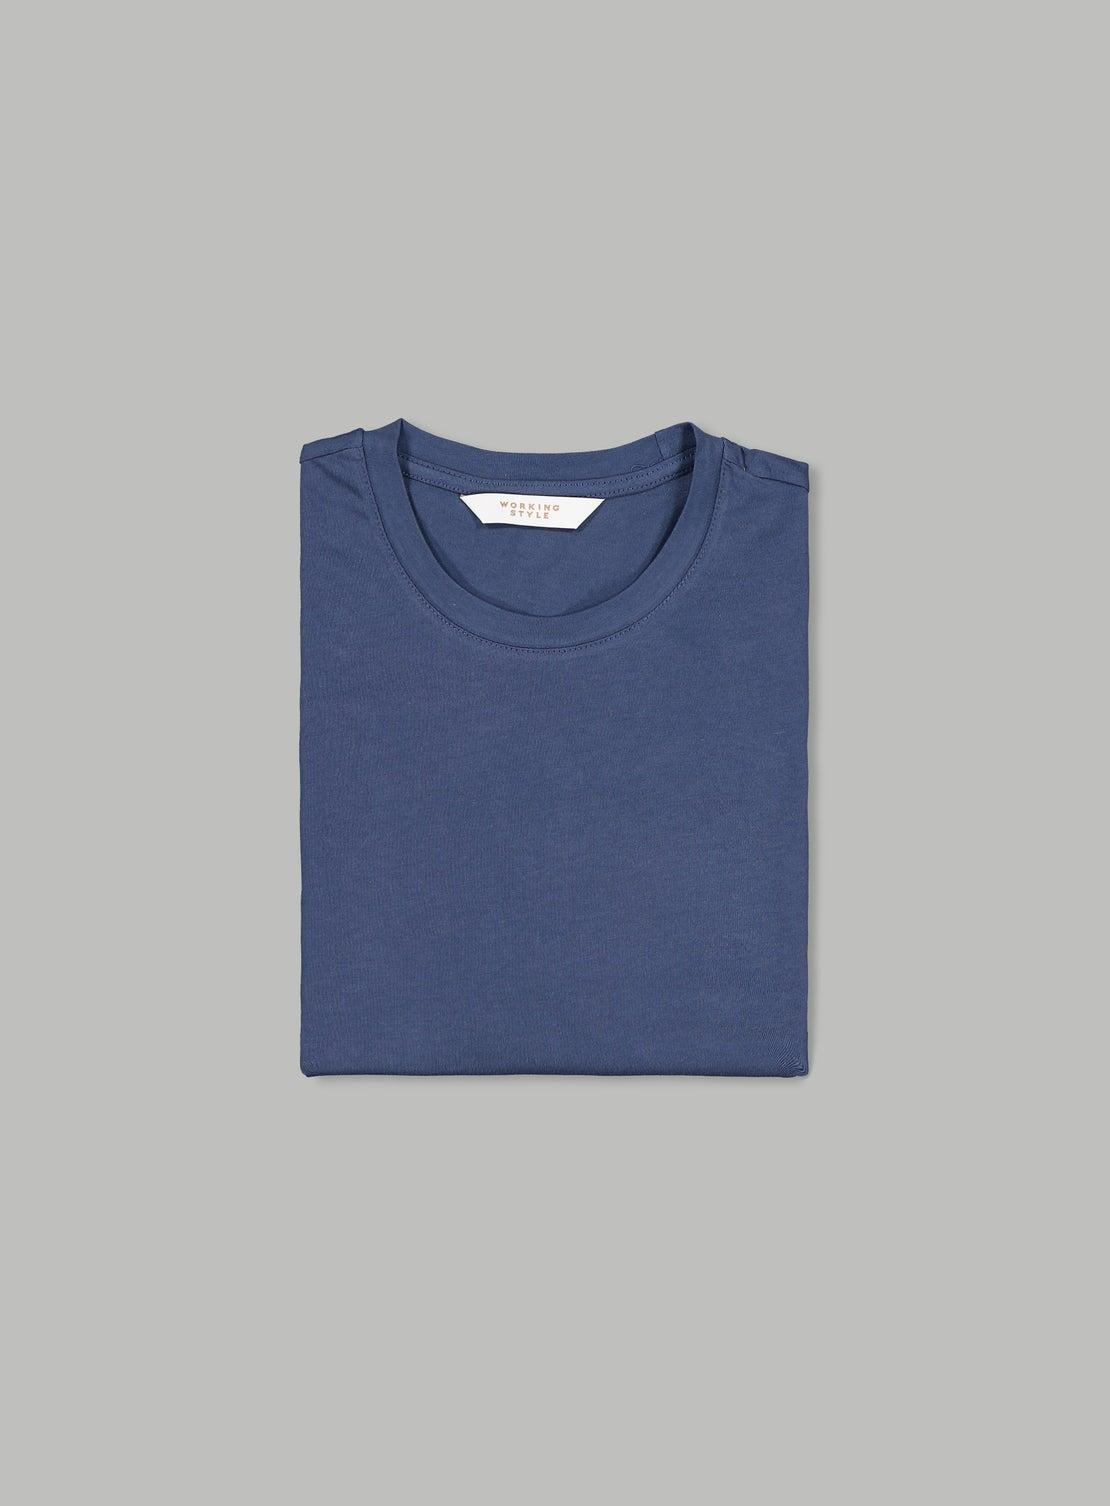 Benny Denim T-Shirt